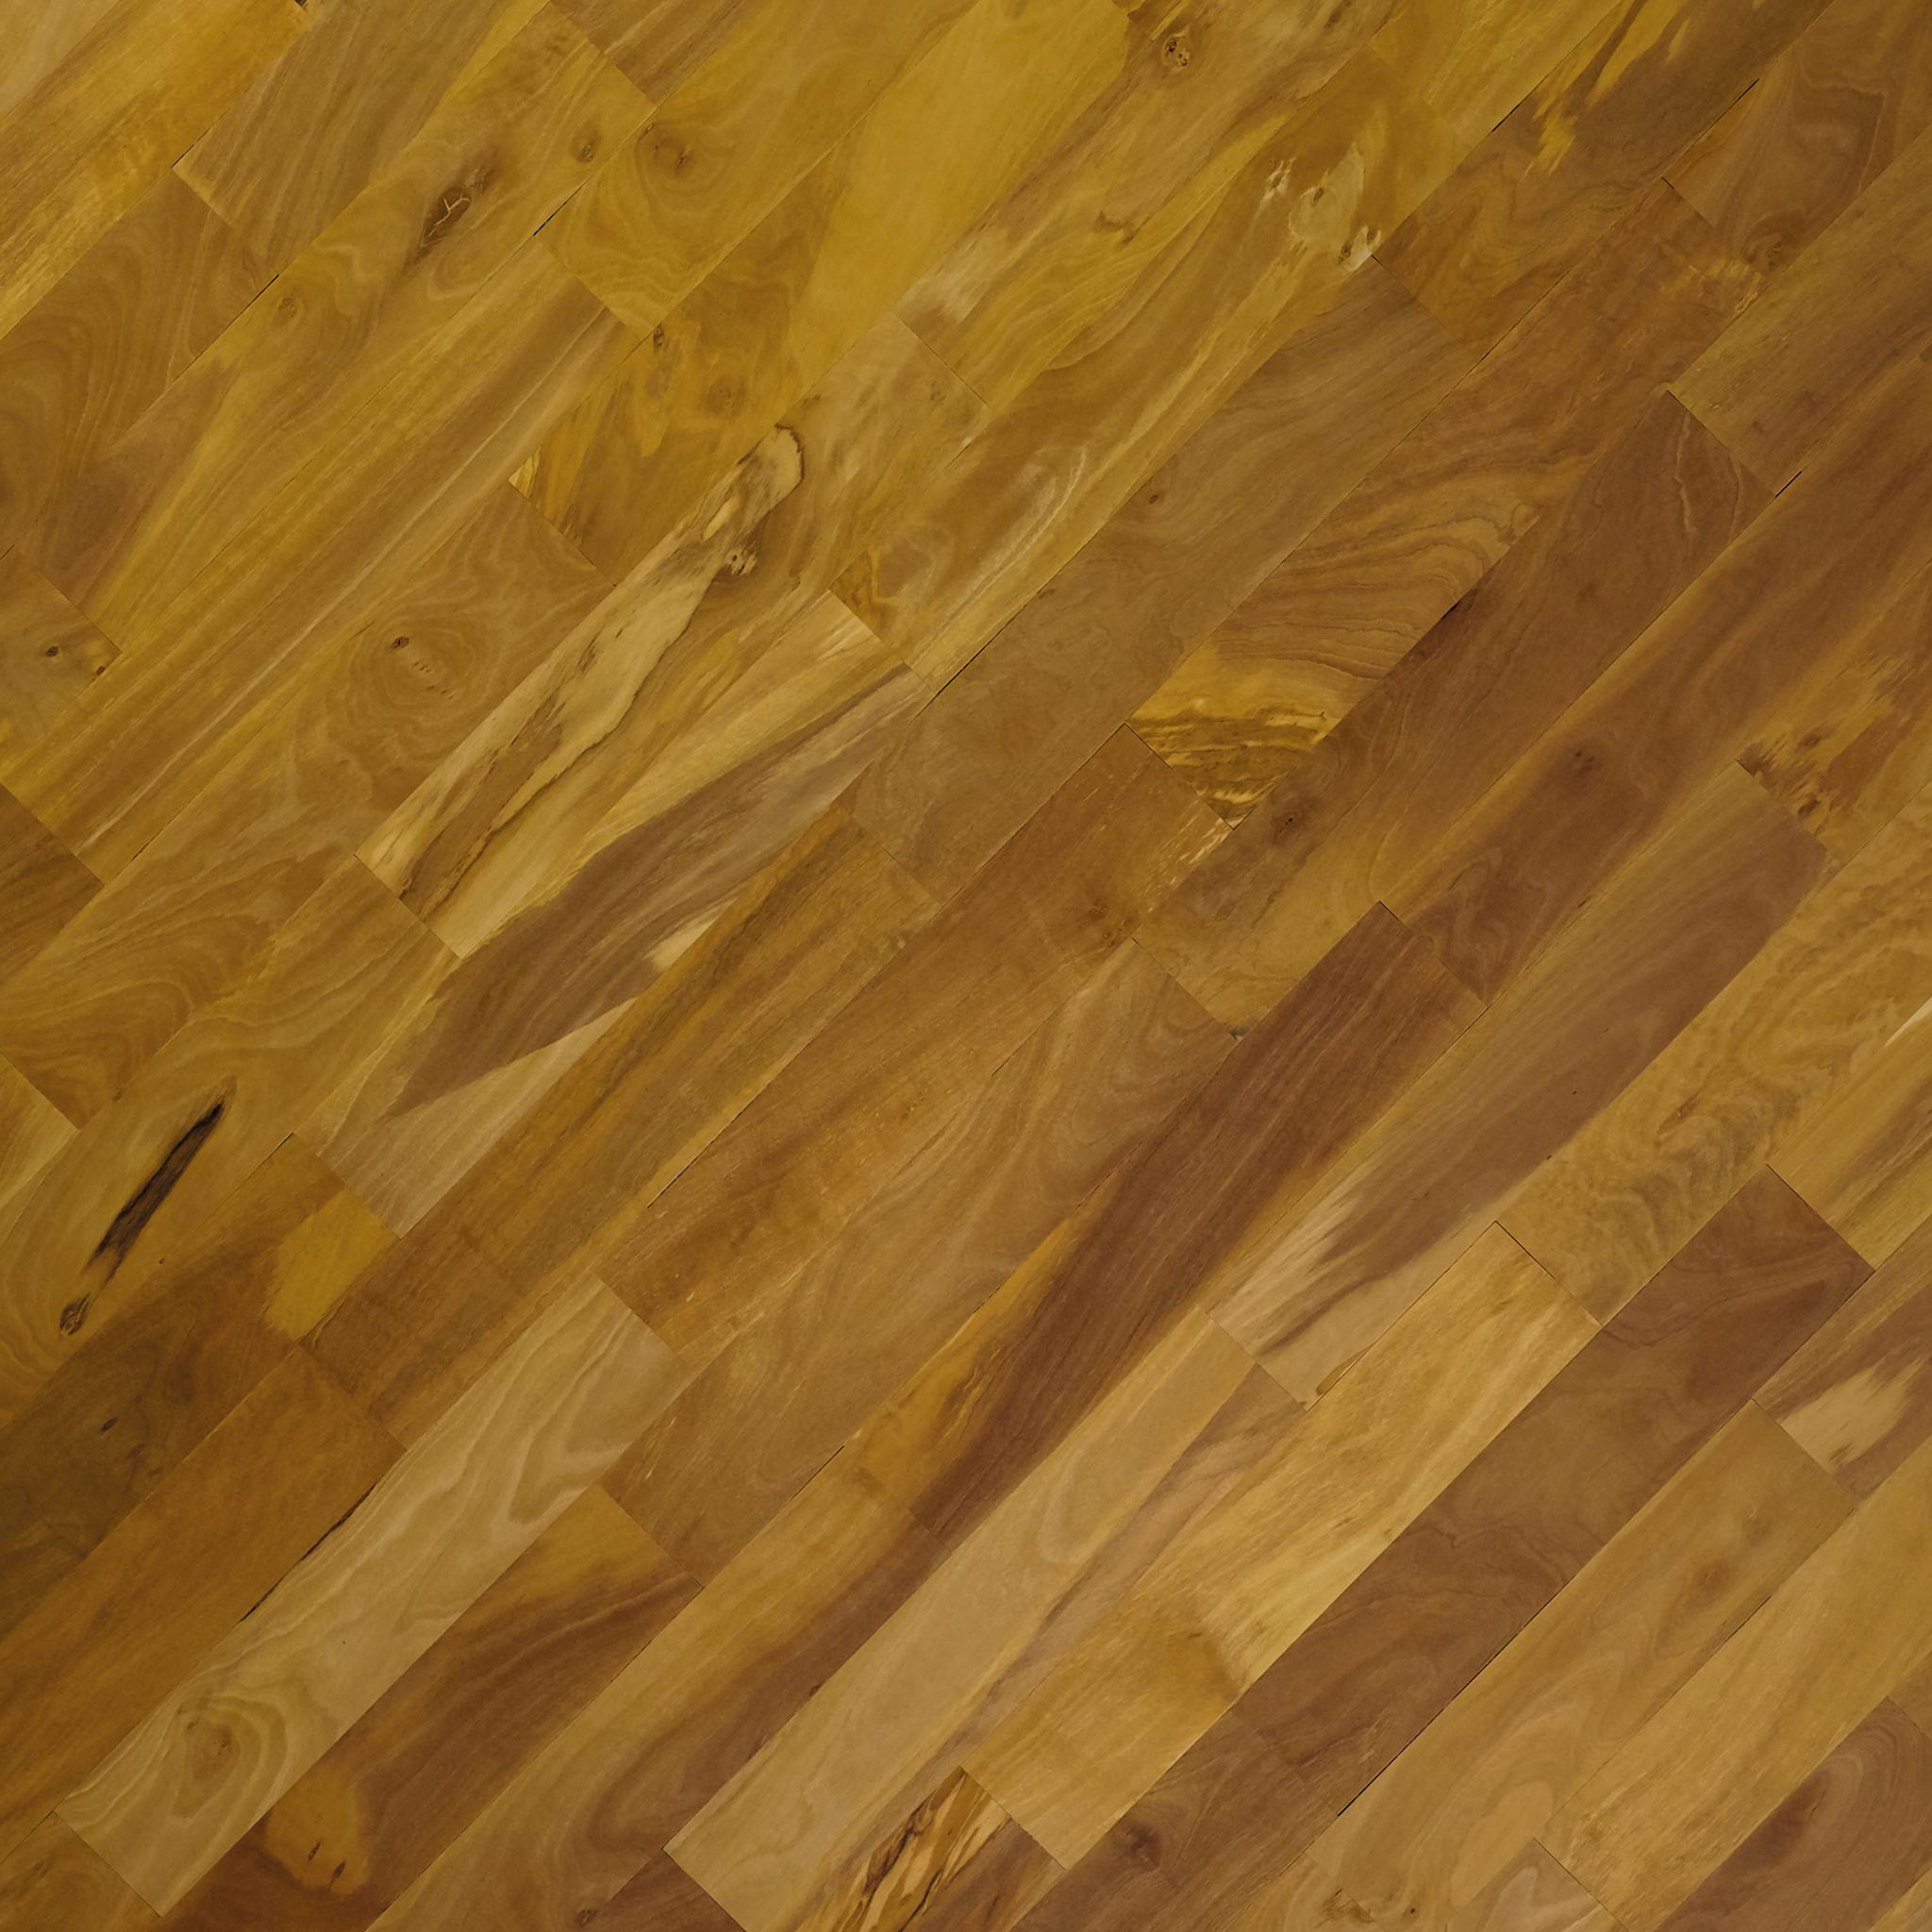 Olive wood parquet Grigio Nodino V14